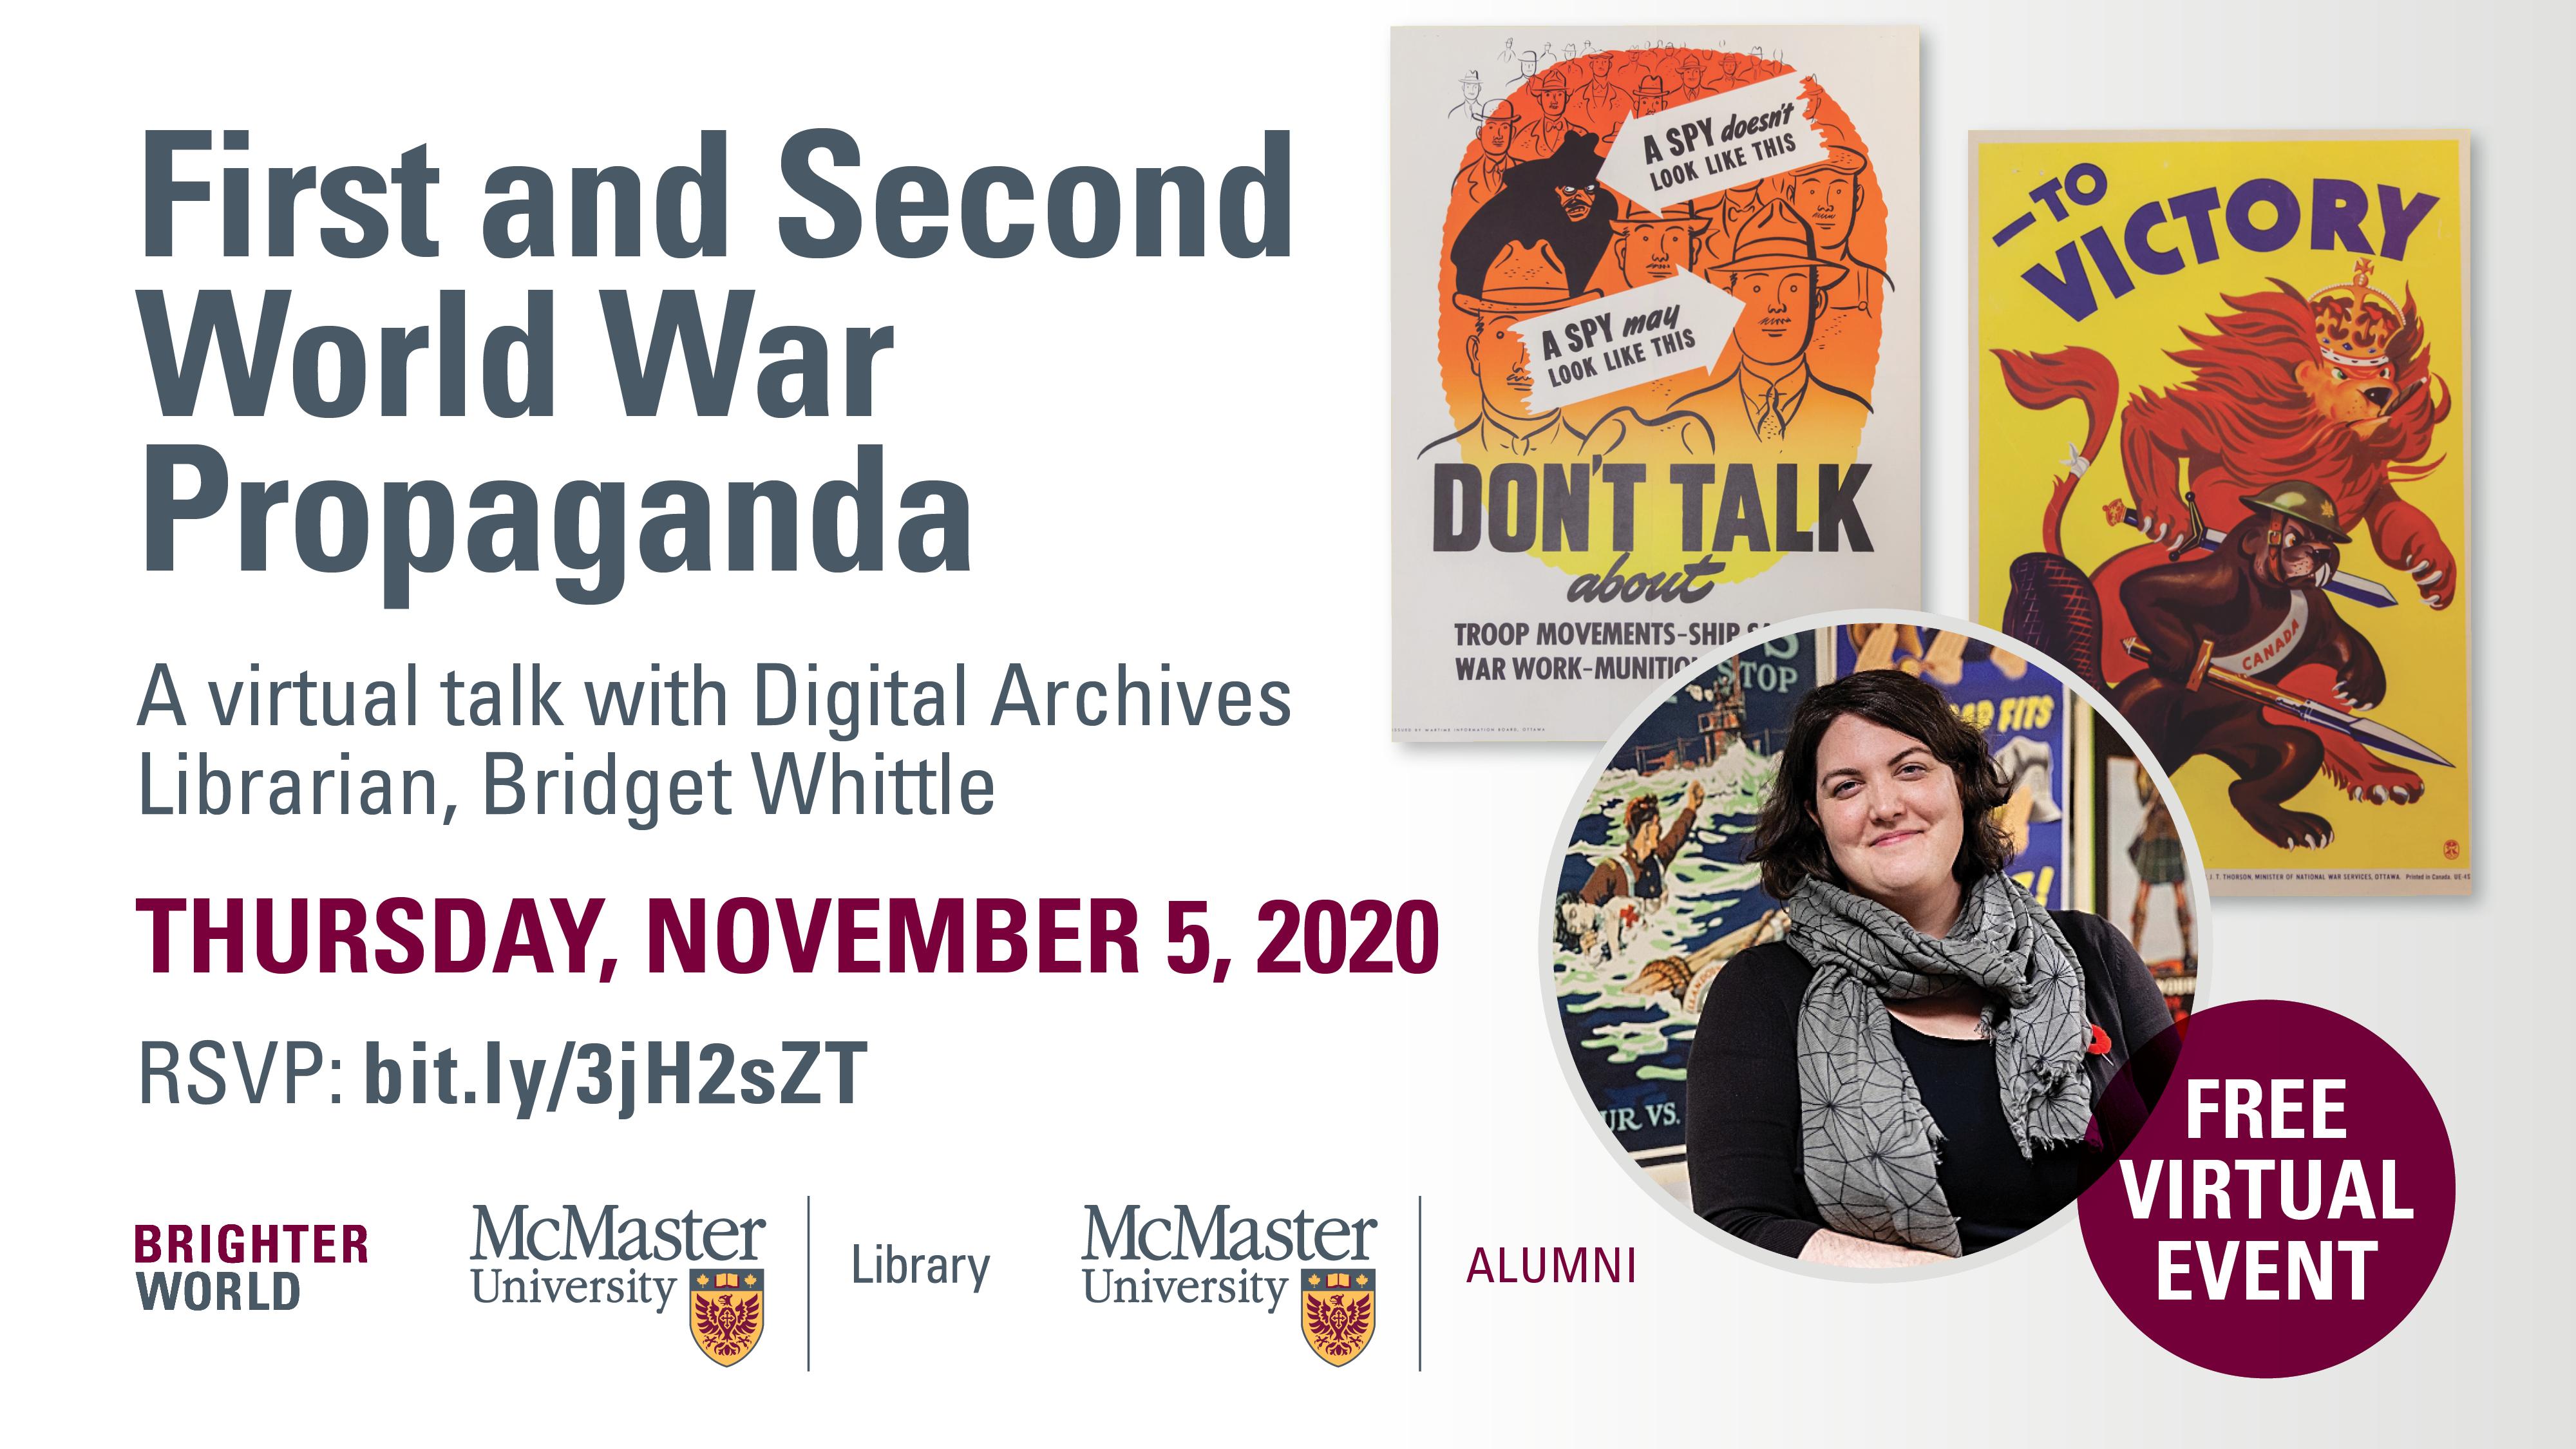 Promotional poster for WW1/WWII propaganda talk